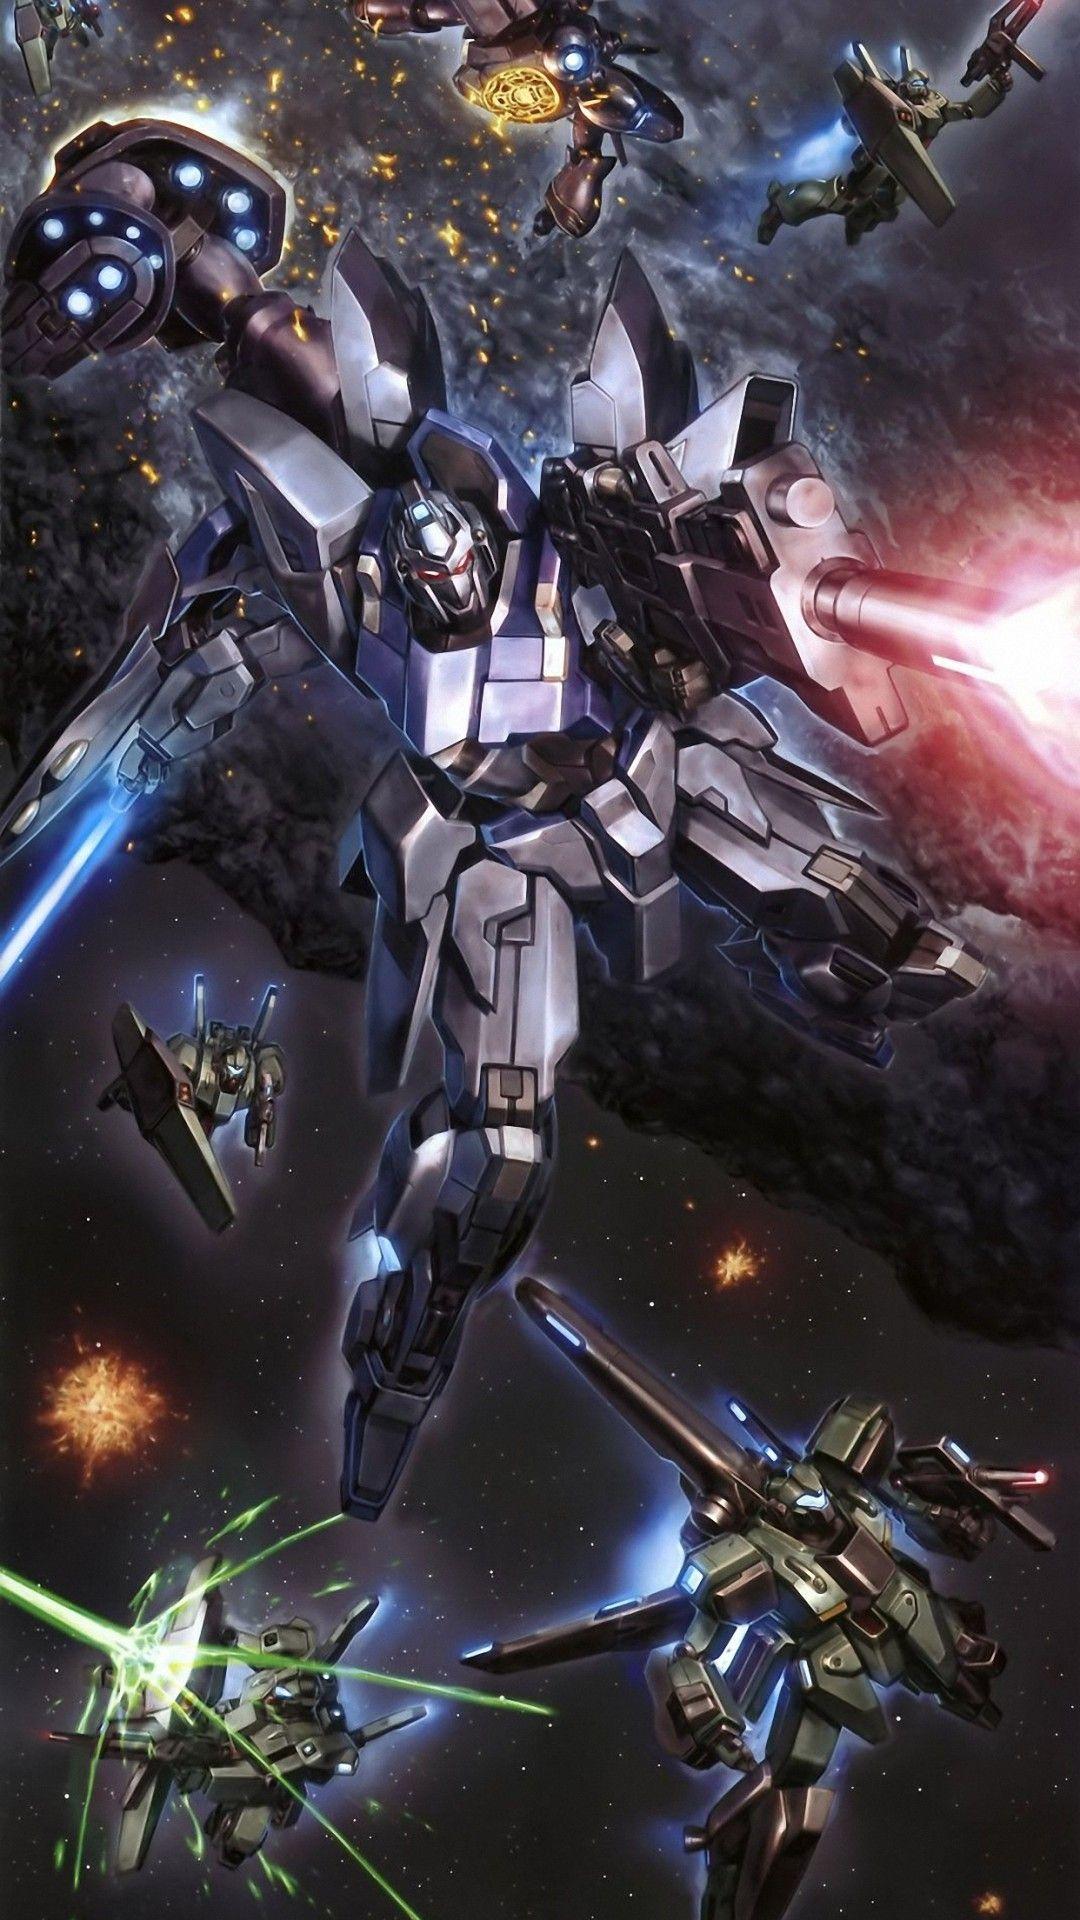 1080x1920 Gundam Iphone 6s Plus Wallpapers Hd 1080x1920 Gundam Wallpapers Anime Wallpaper Iphone 6s Wallpaper